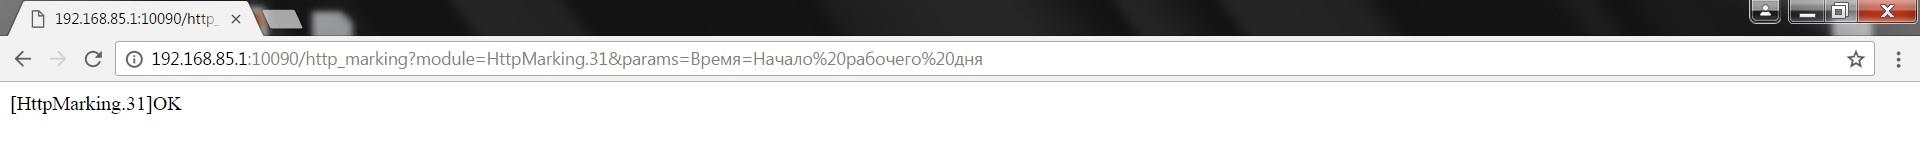 http_marking_1